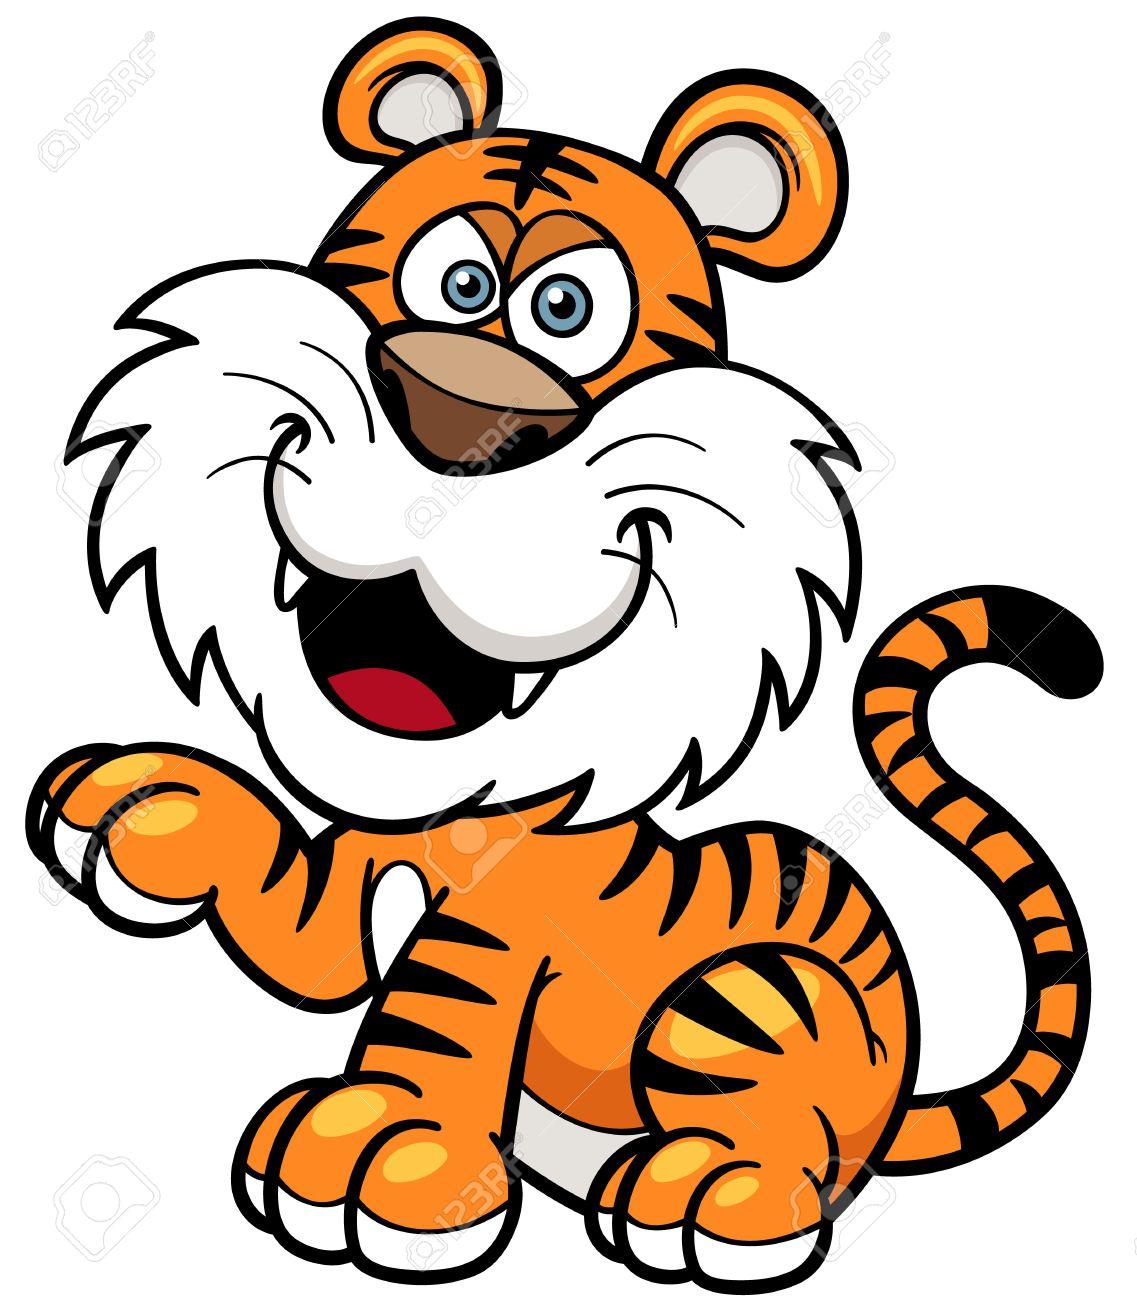 Tiger cartoon clipart - ClipartFest